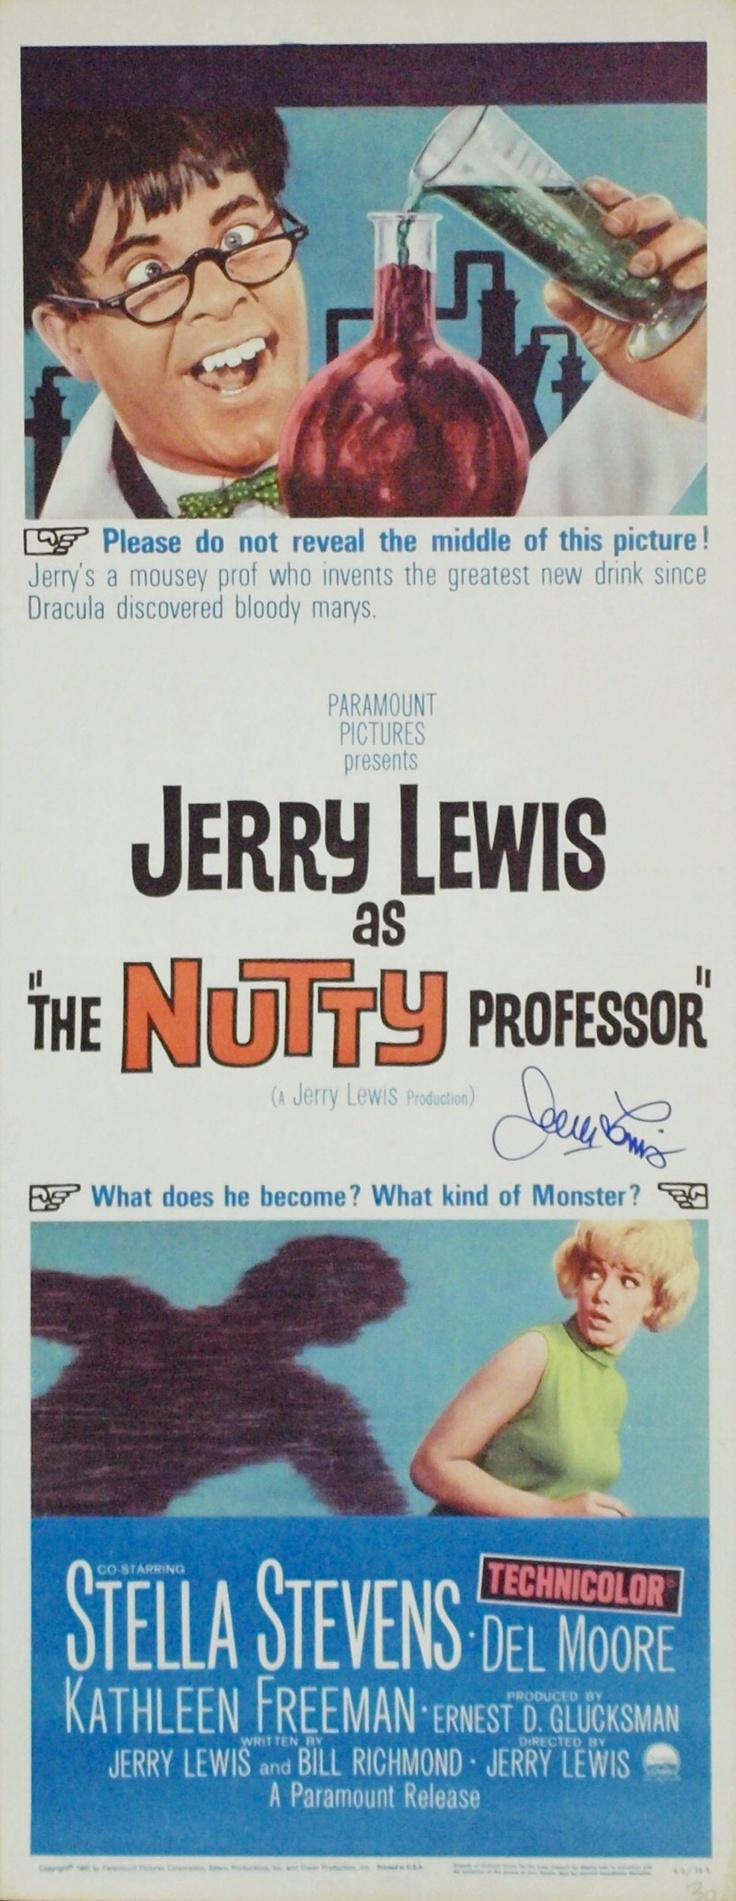 The Nutty Professor (1963) - Jerry Lewis, Stella Stevens, Del Moore, Kathleen Freeman